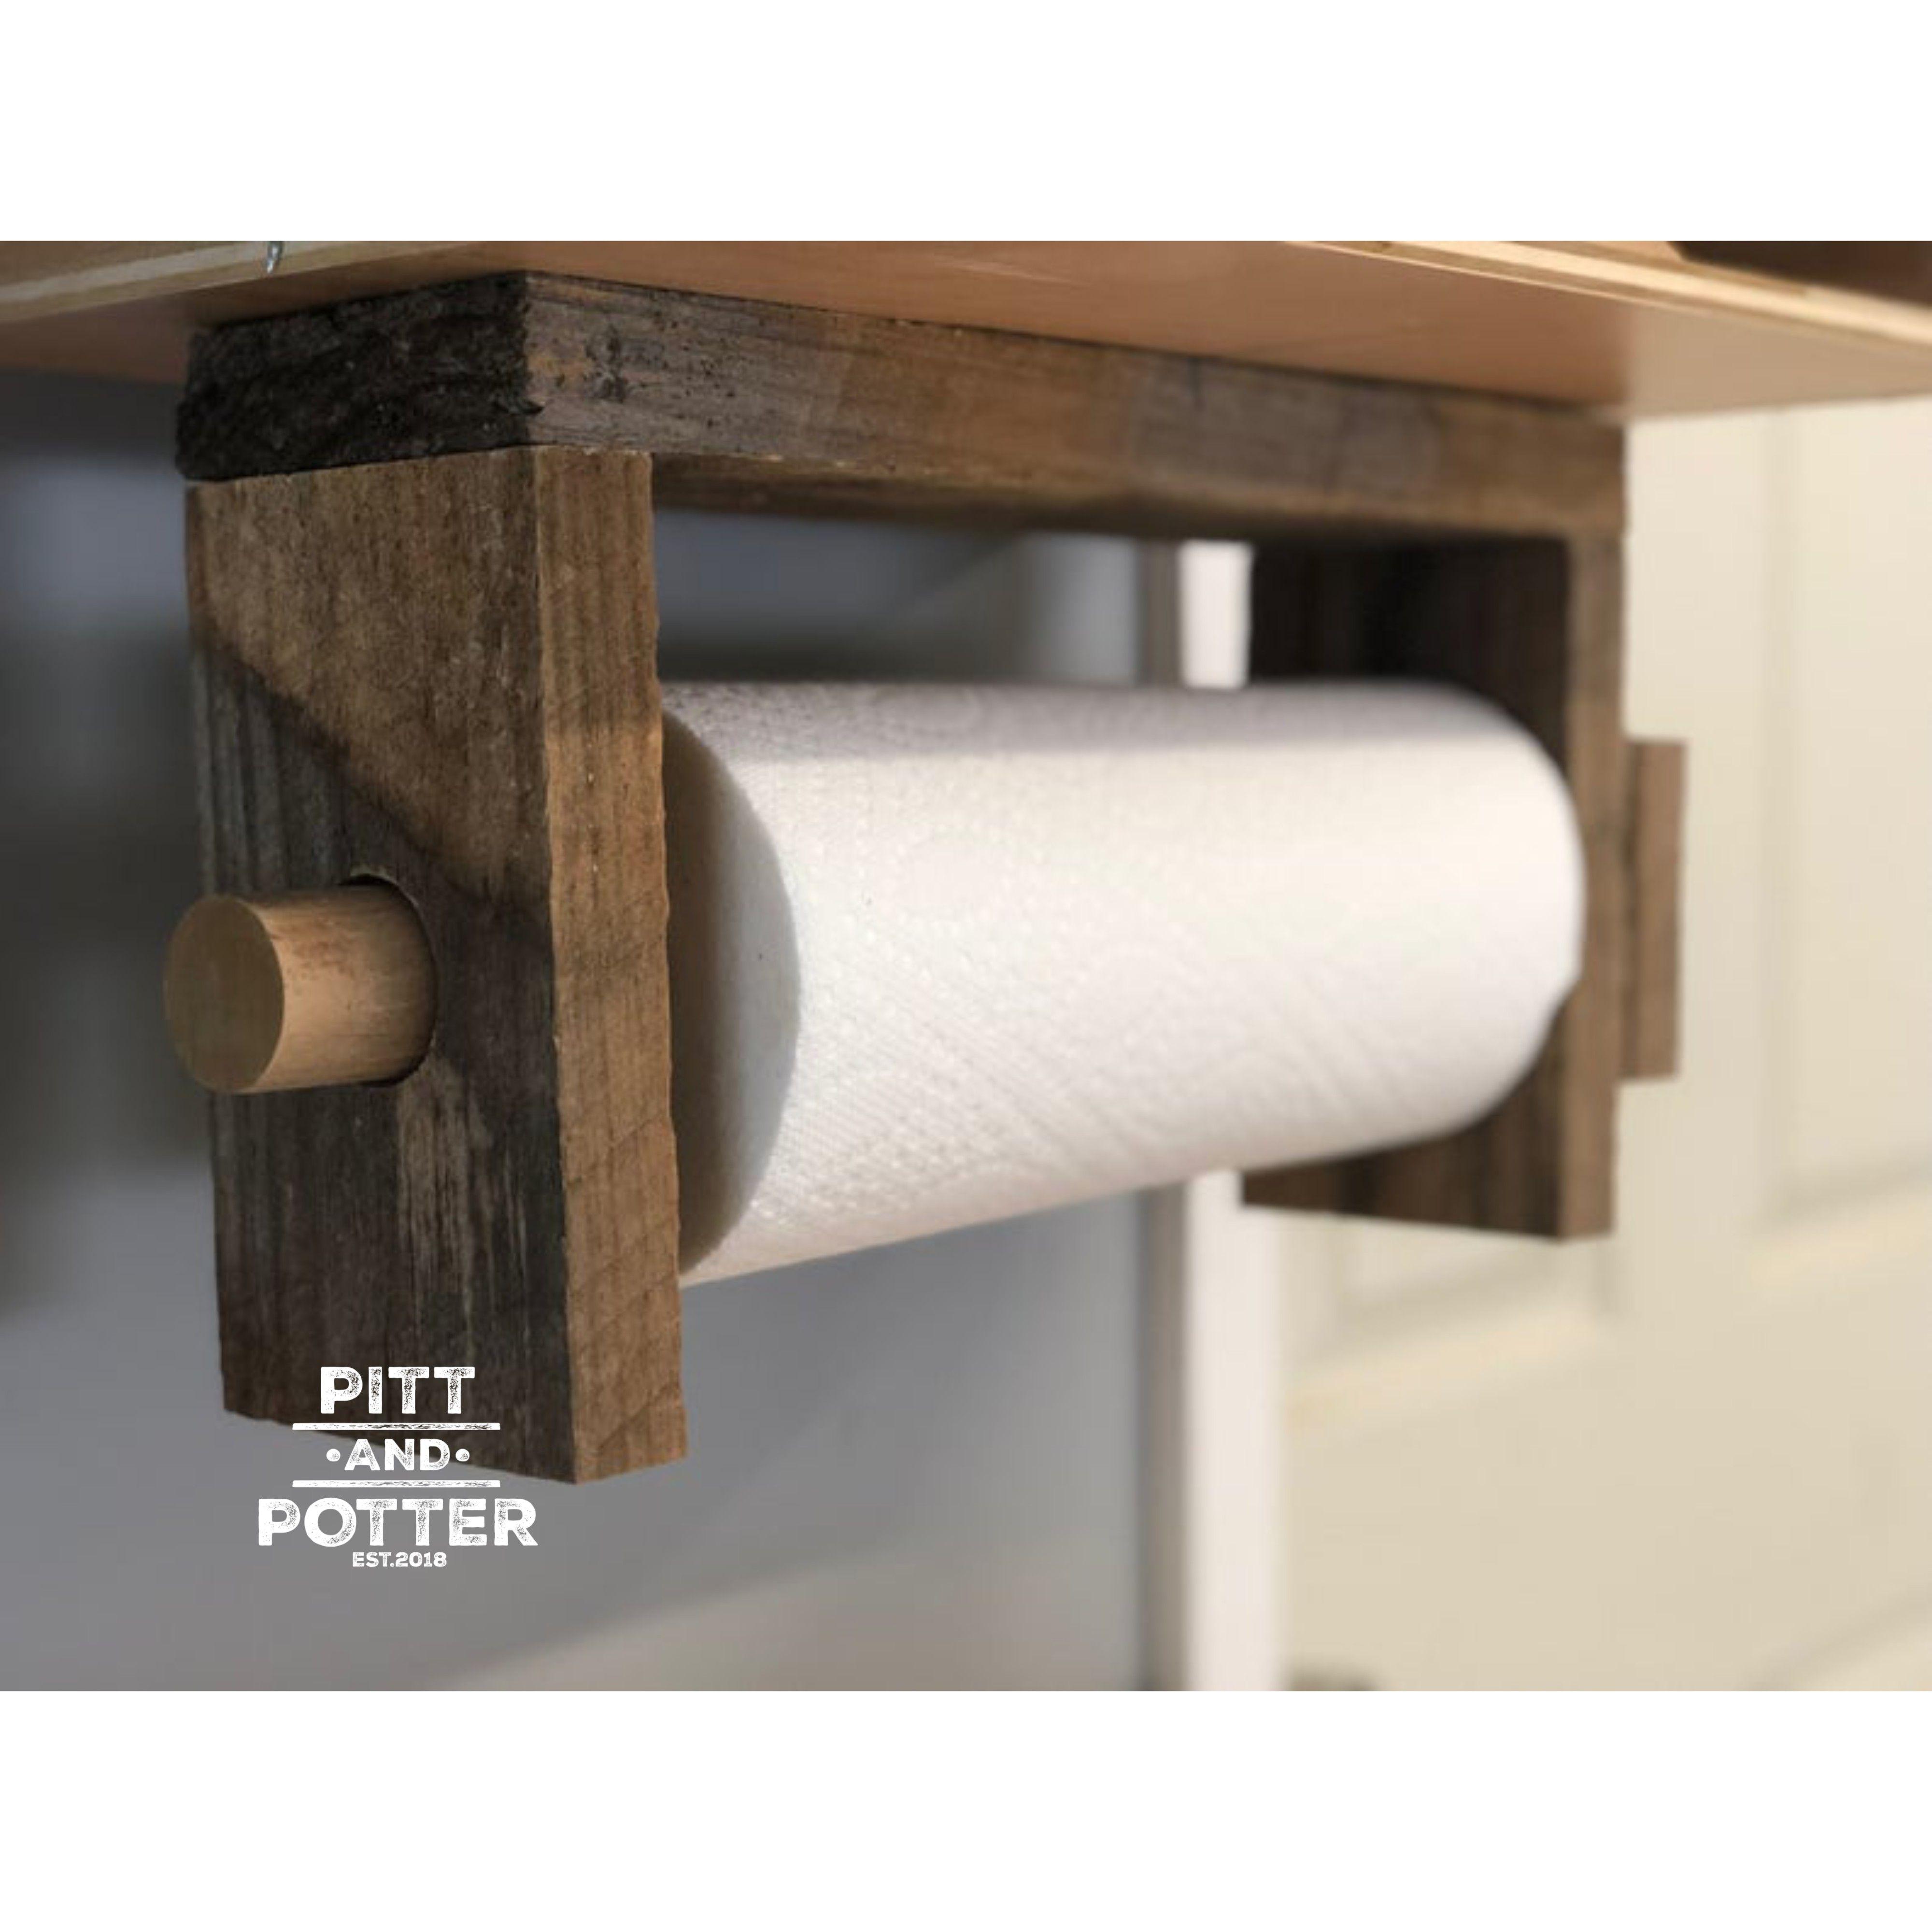 Paper Towel Holder Paper Towel Stand Under Cabinet Paper Etsy In 2020 Wooden Paper Towel Holder Rustic Paper Towel Holders Rustic Paper